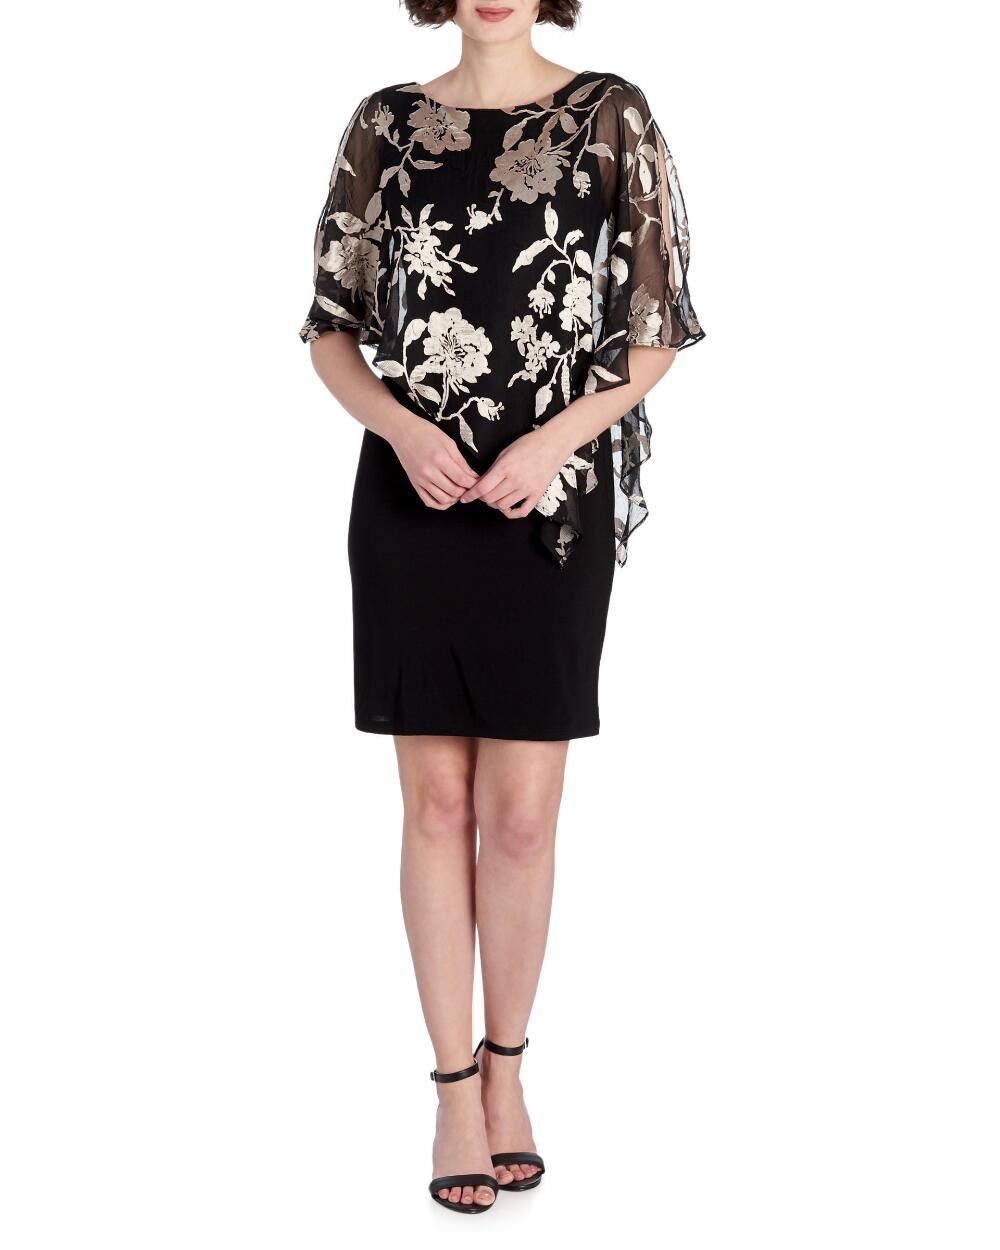 Metallic Floral Chiffon Poncho Sheath Dress Shop By Occasion Dresses Stein Mart Floral Chiffon Sheath Dress Chiffon [ 1250 x 1000 Pixel ]